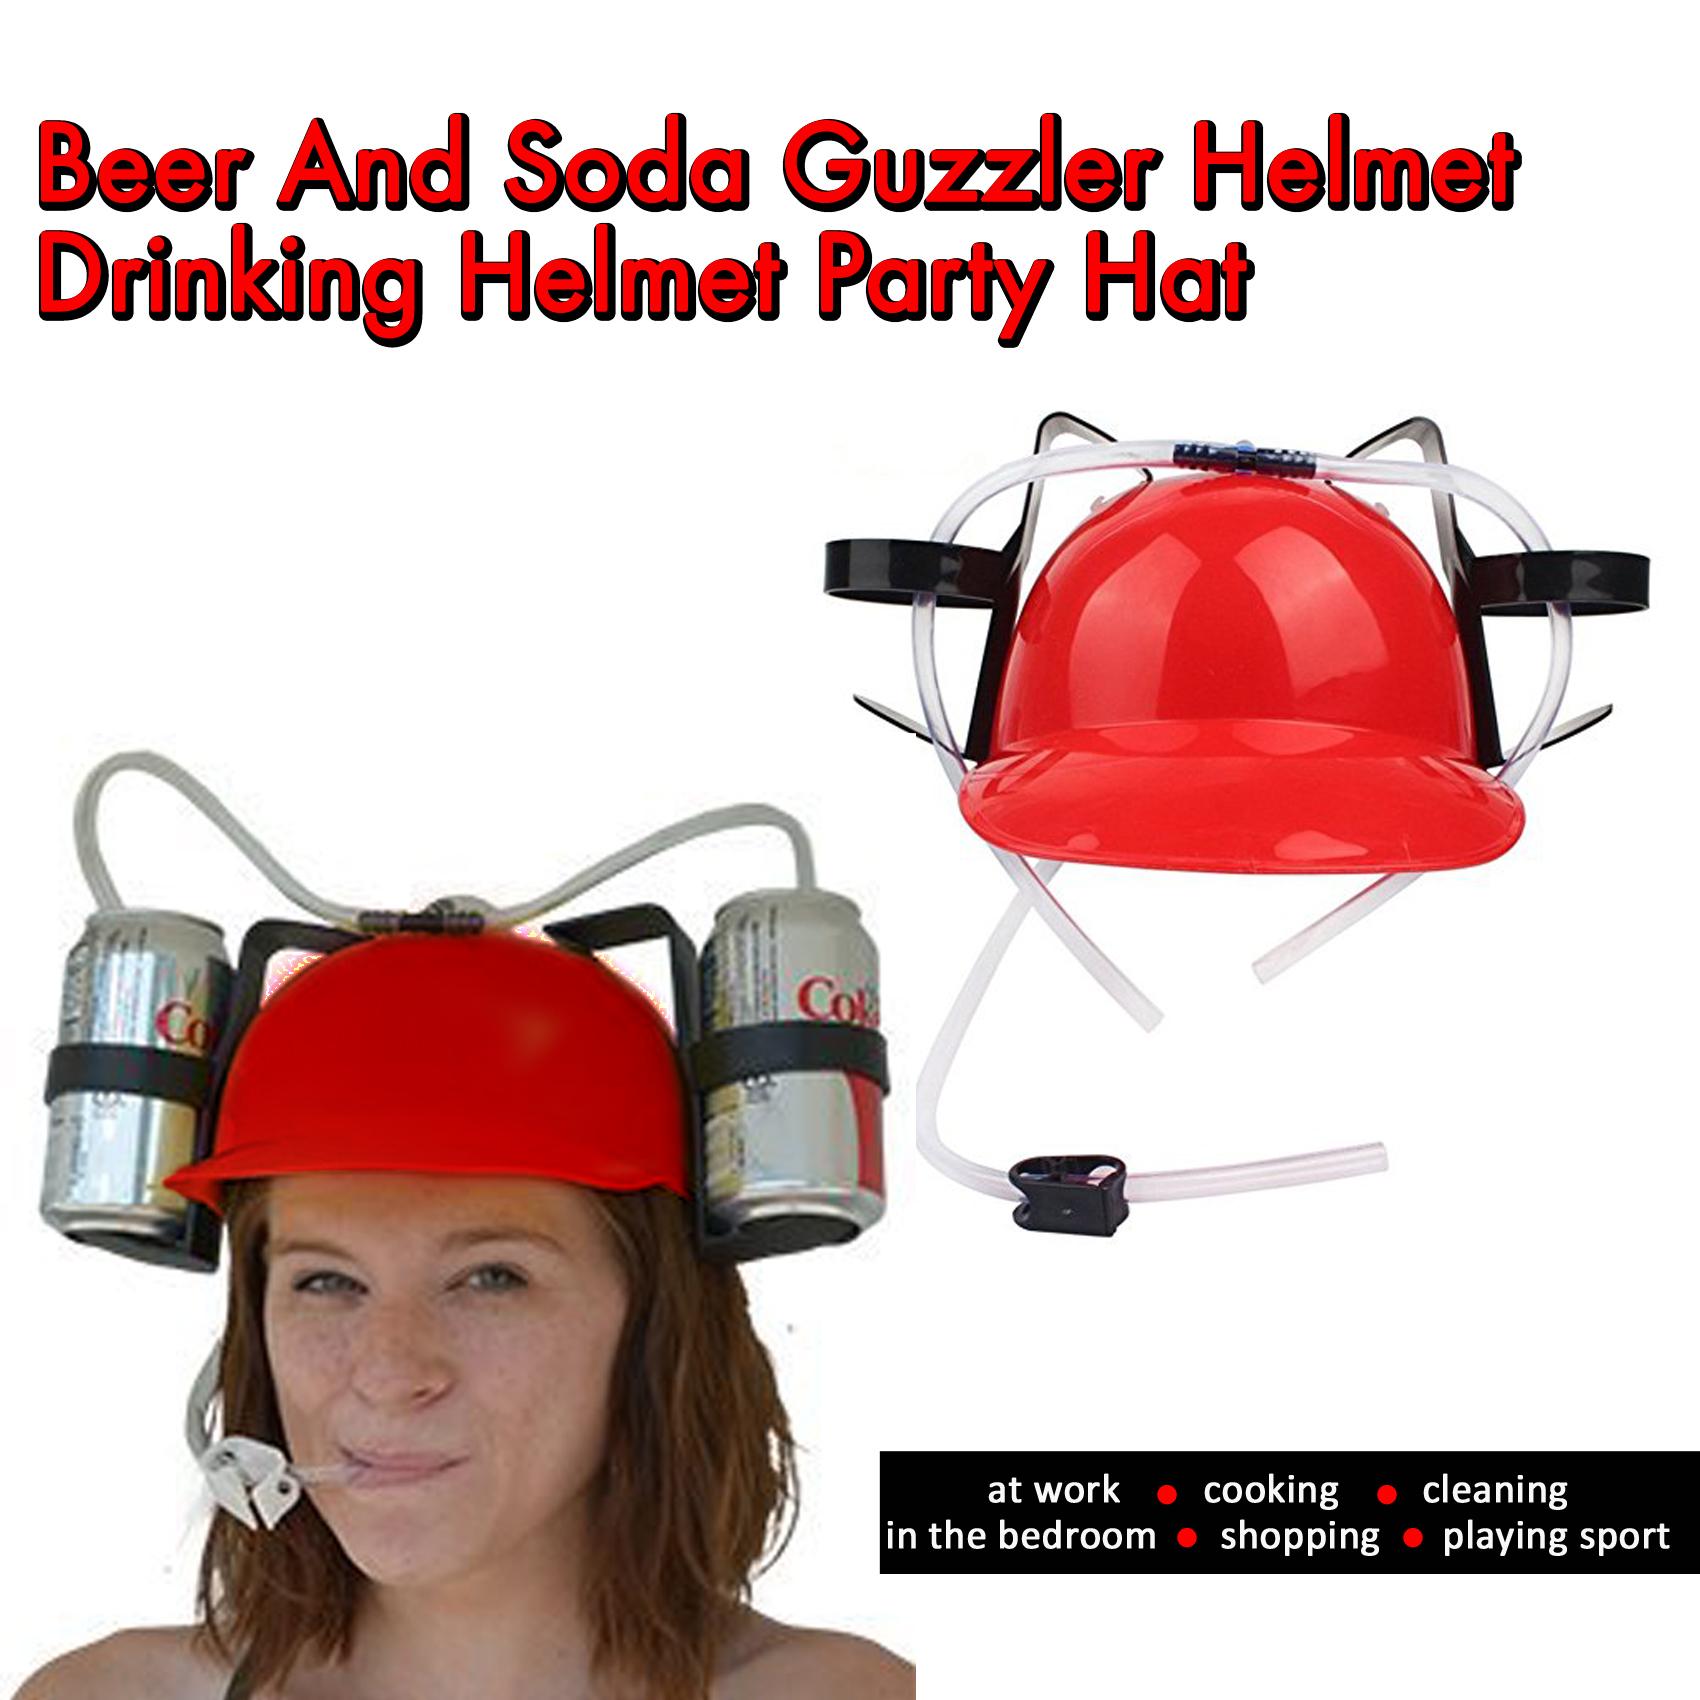 Beer And Soda Guzzler Helmet Drinking Helmet Party Hat - Red